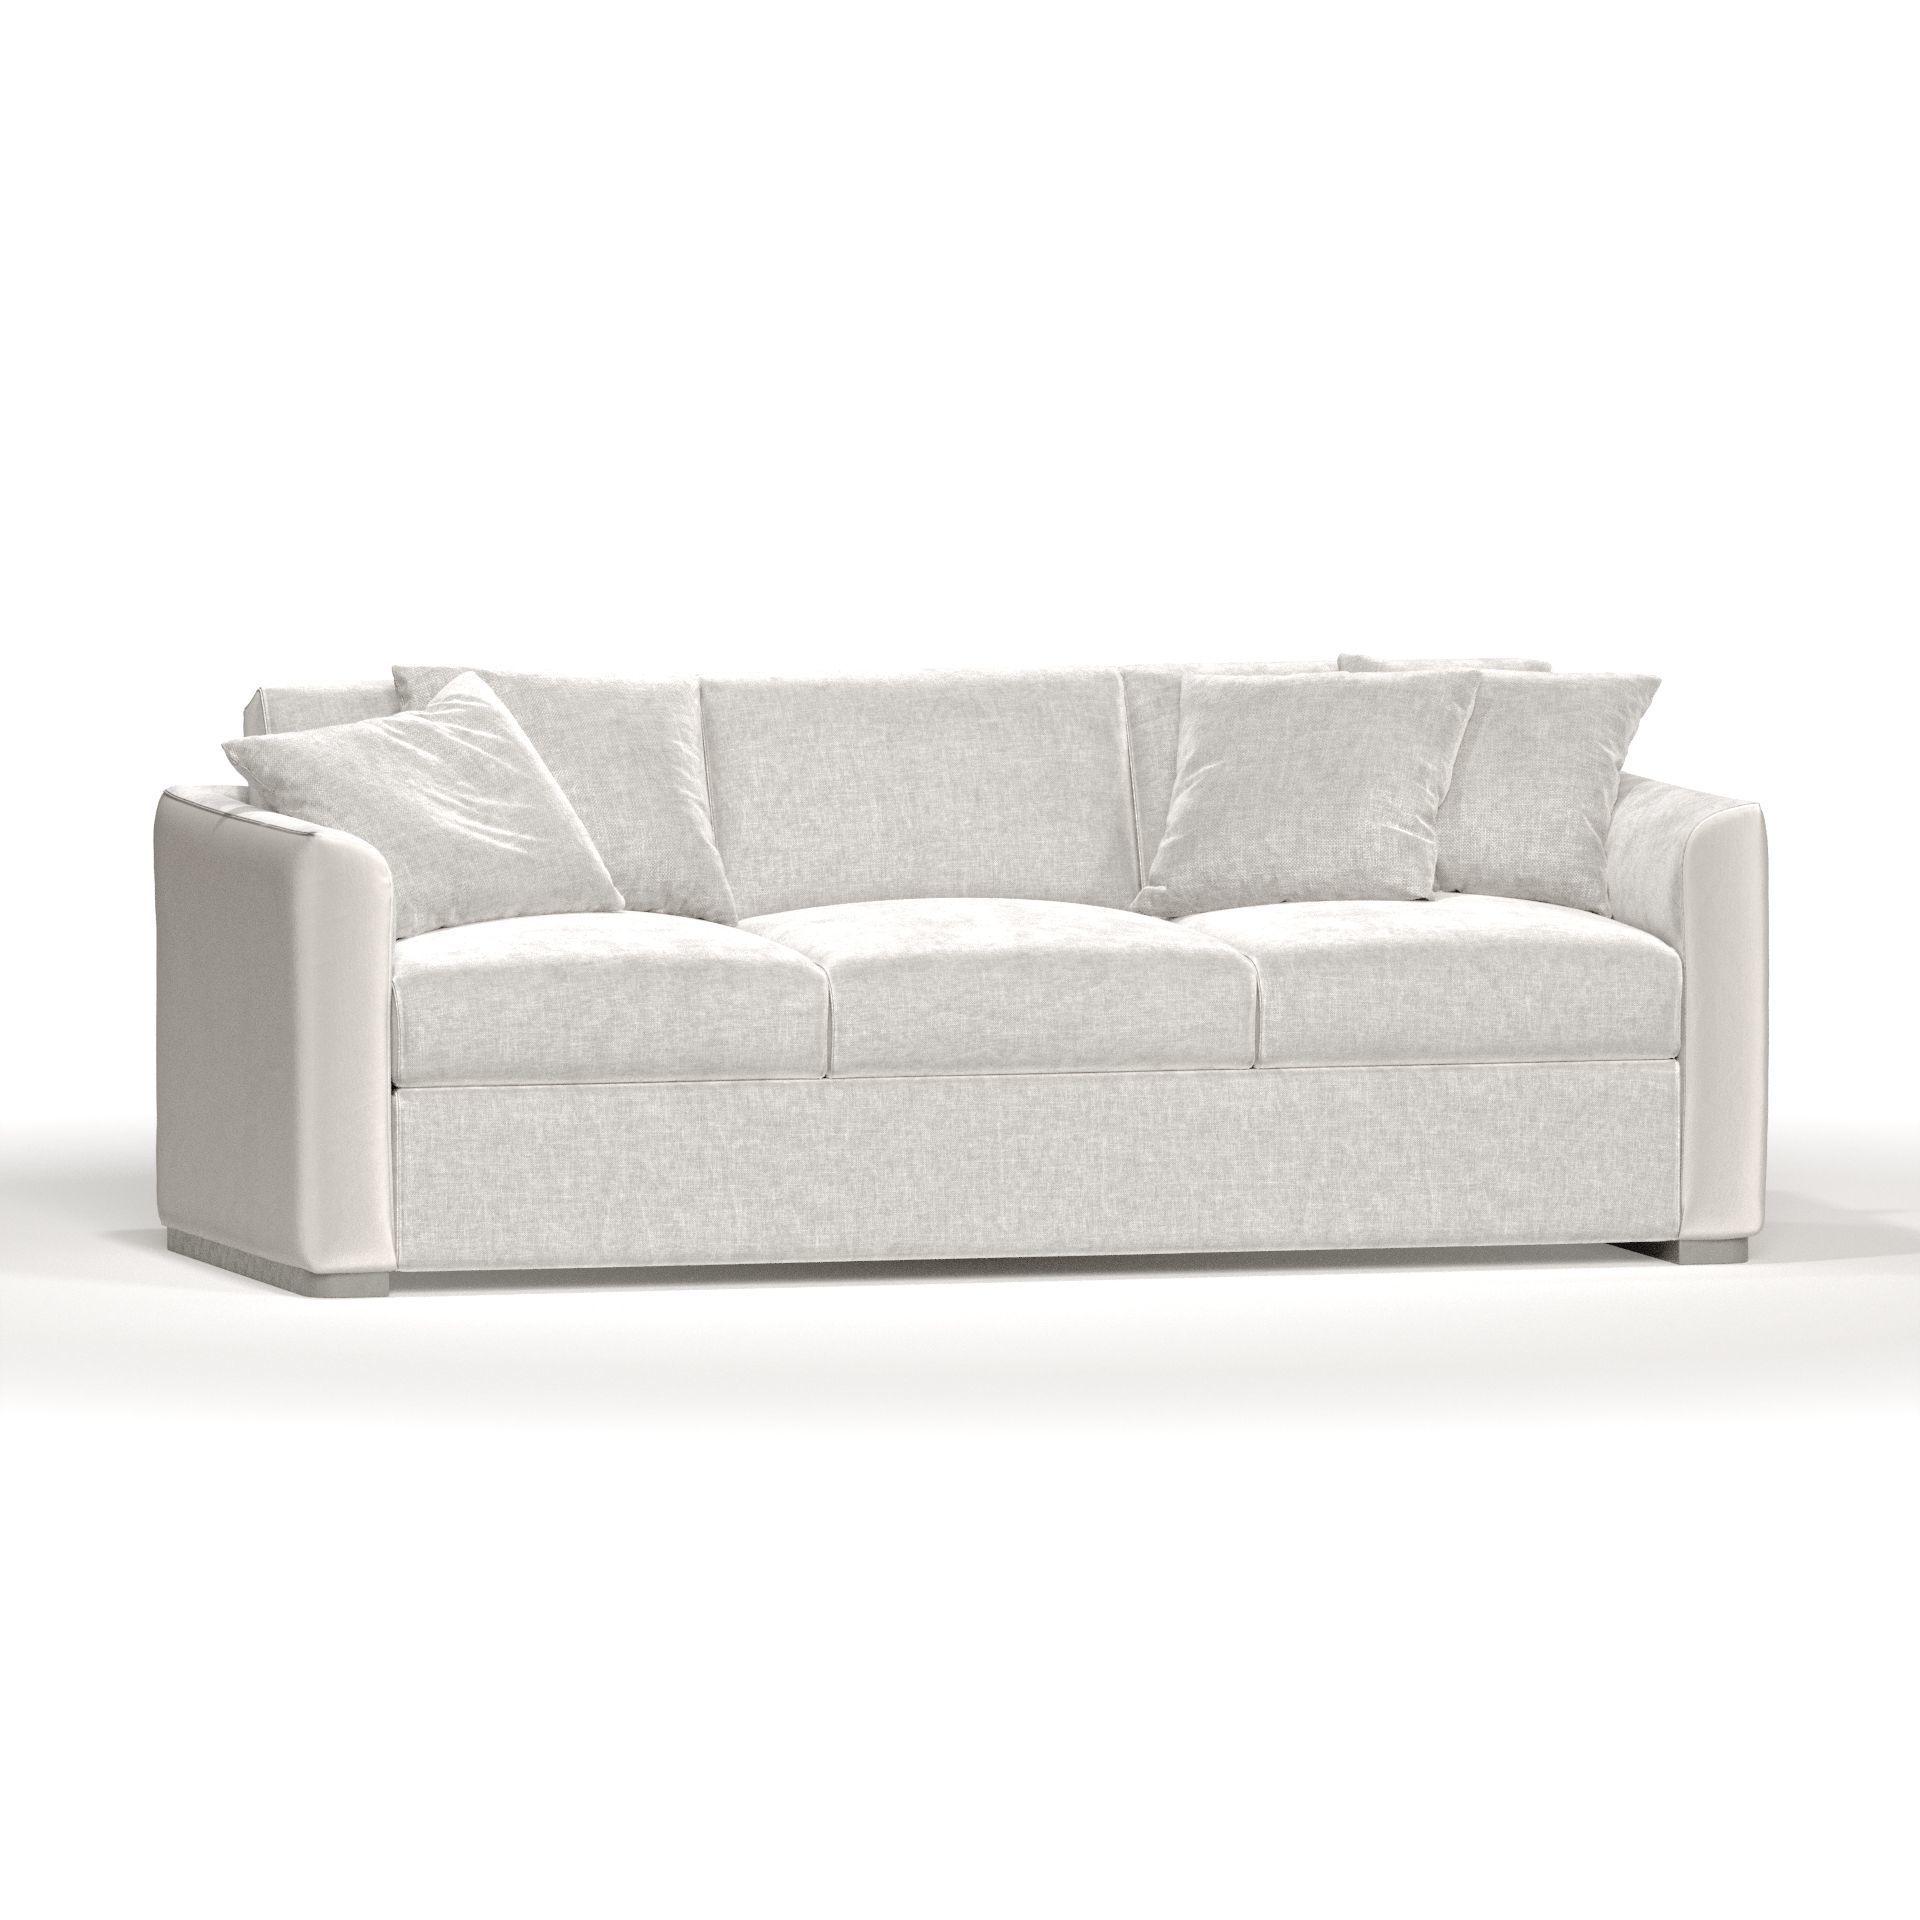 a rudin sofa 2859 loft bed marks and spencer 3d 2786 cgtrader model max obj mtl fbx 2